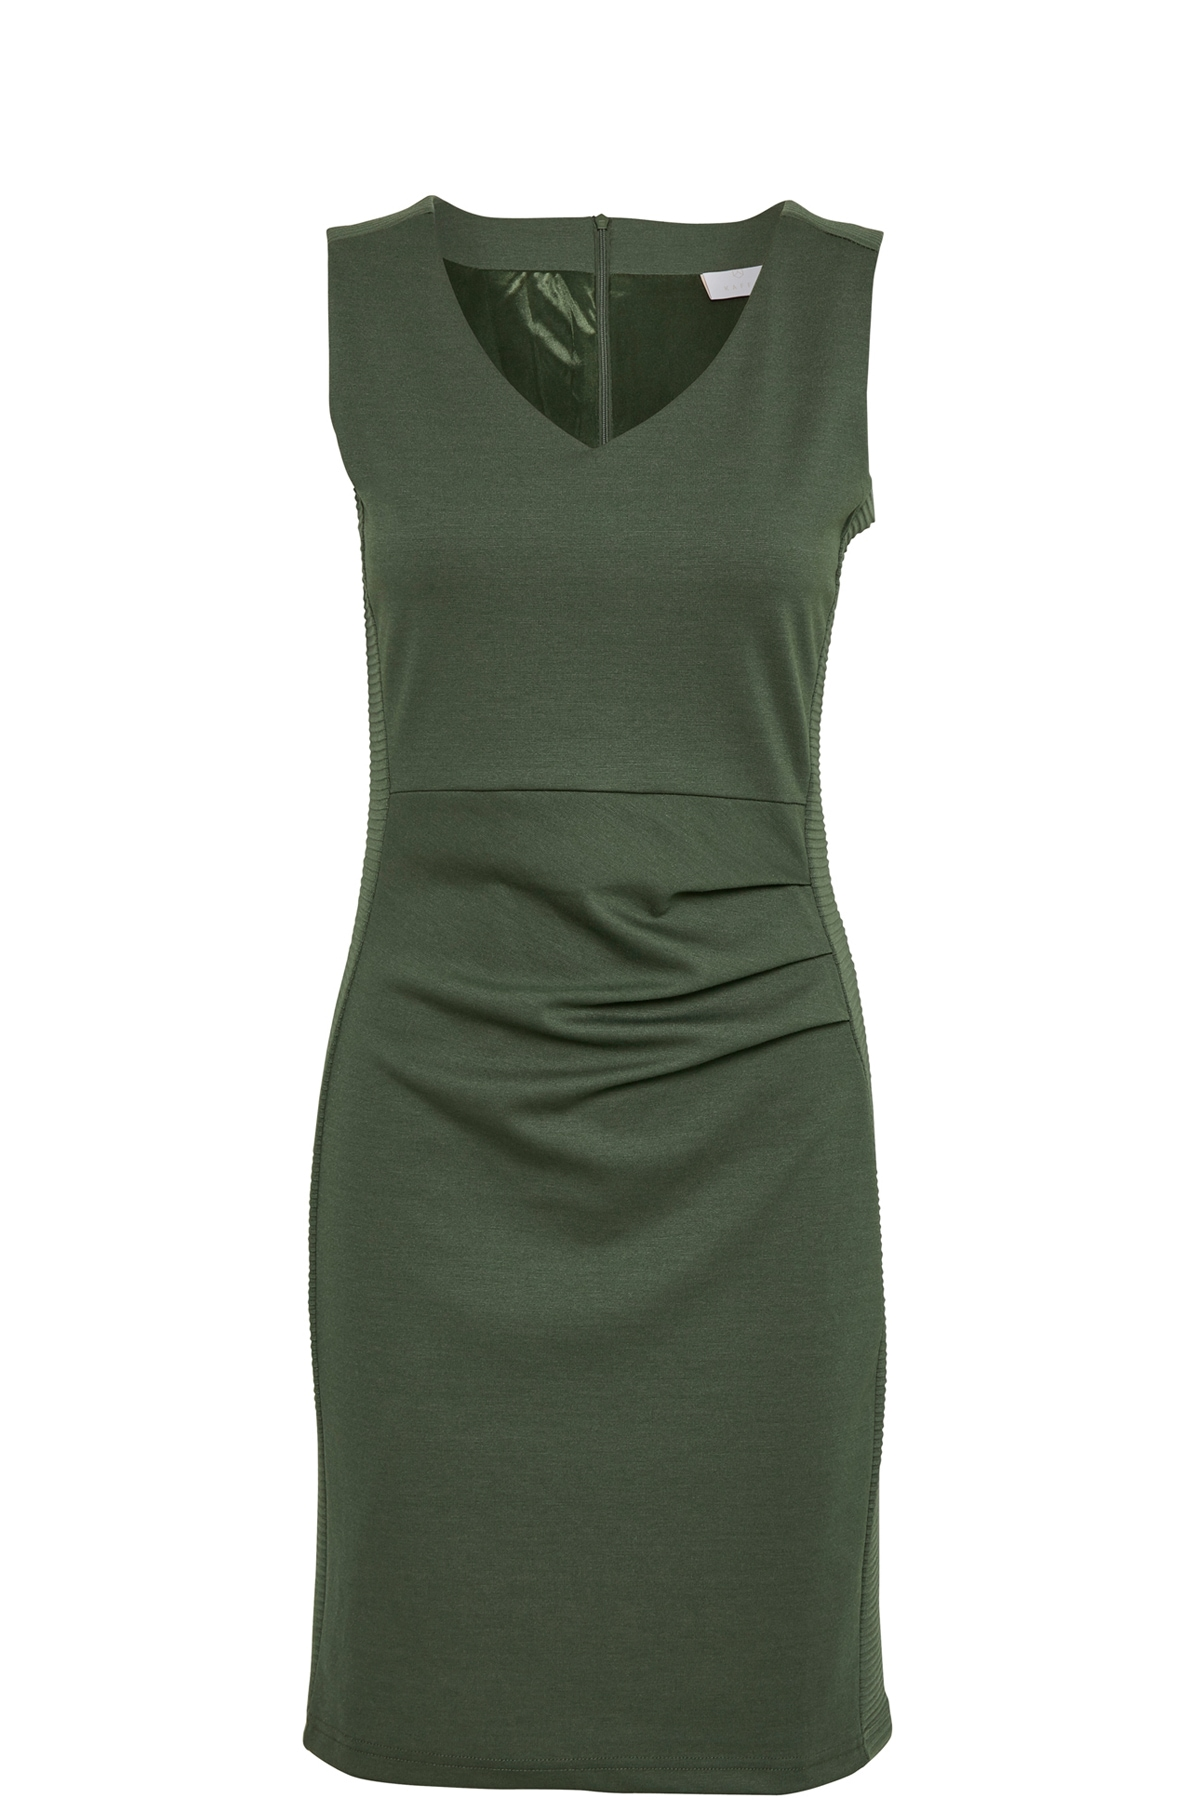 KAFFE Abendkleid Sara Damenmode/Bekleidung/Kleider/Abendkleider